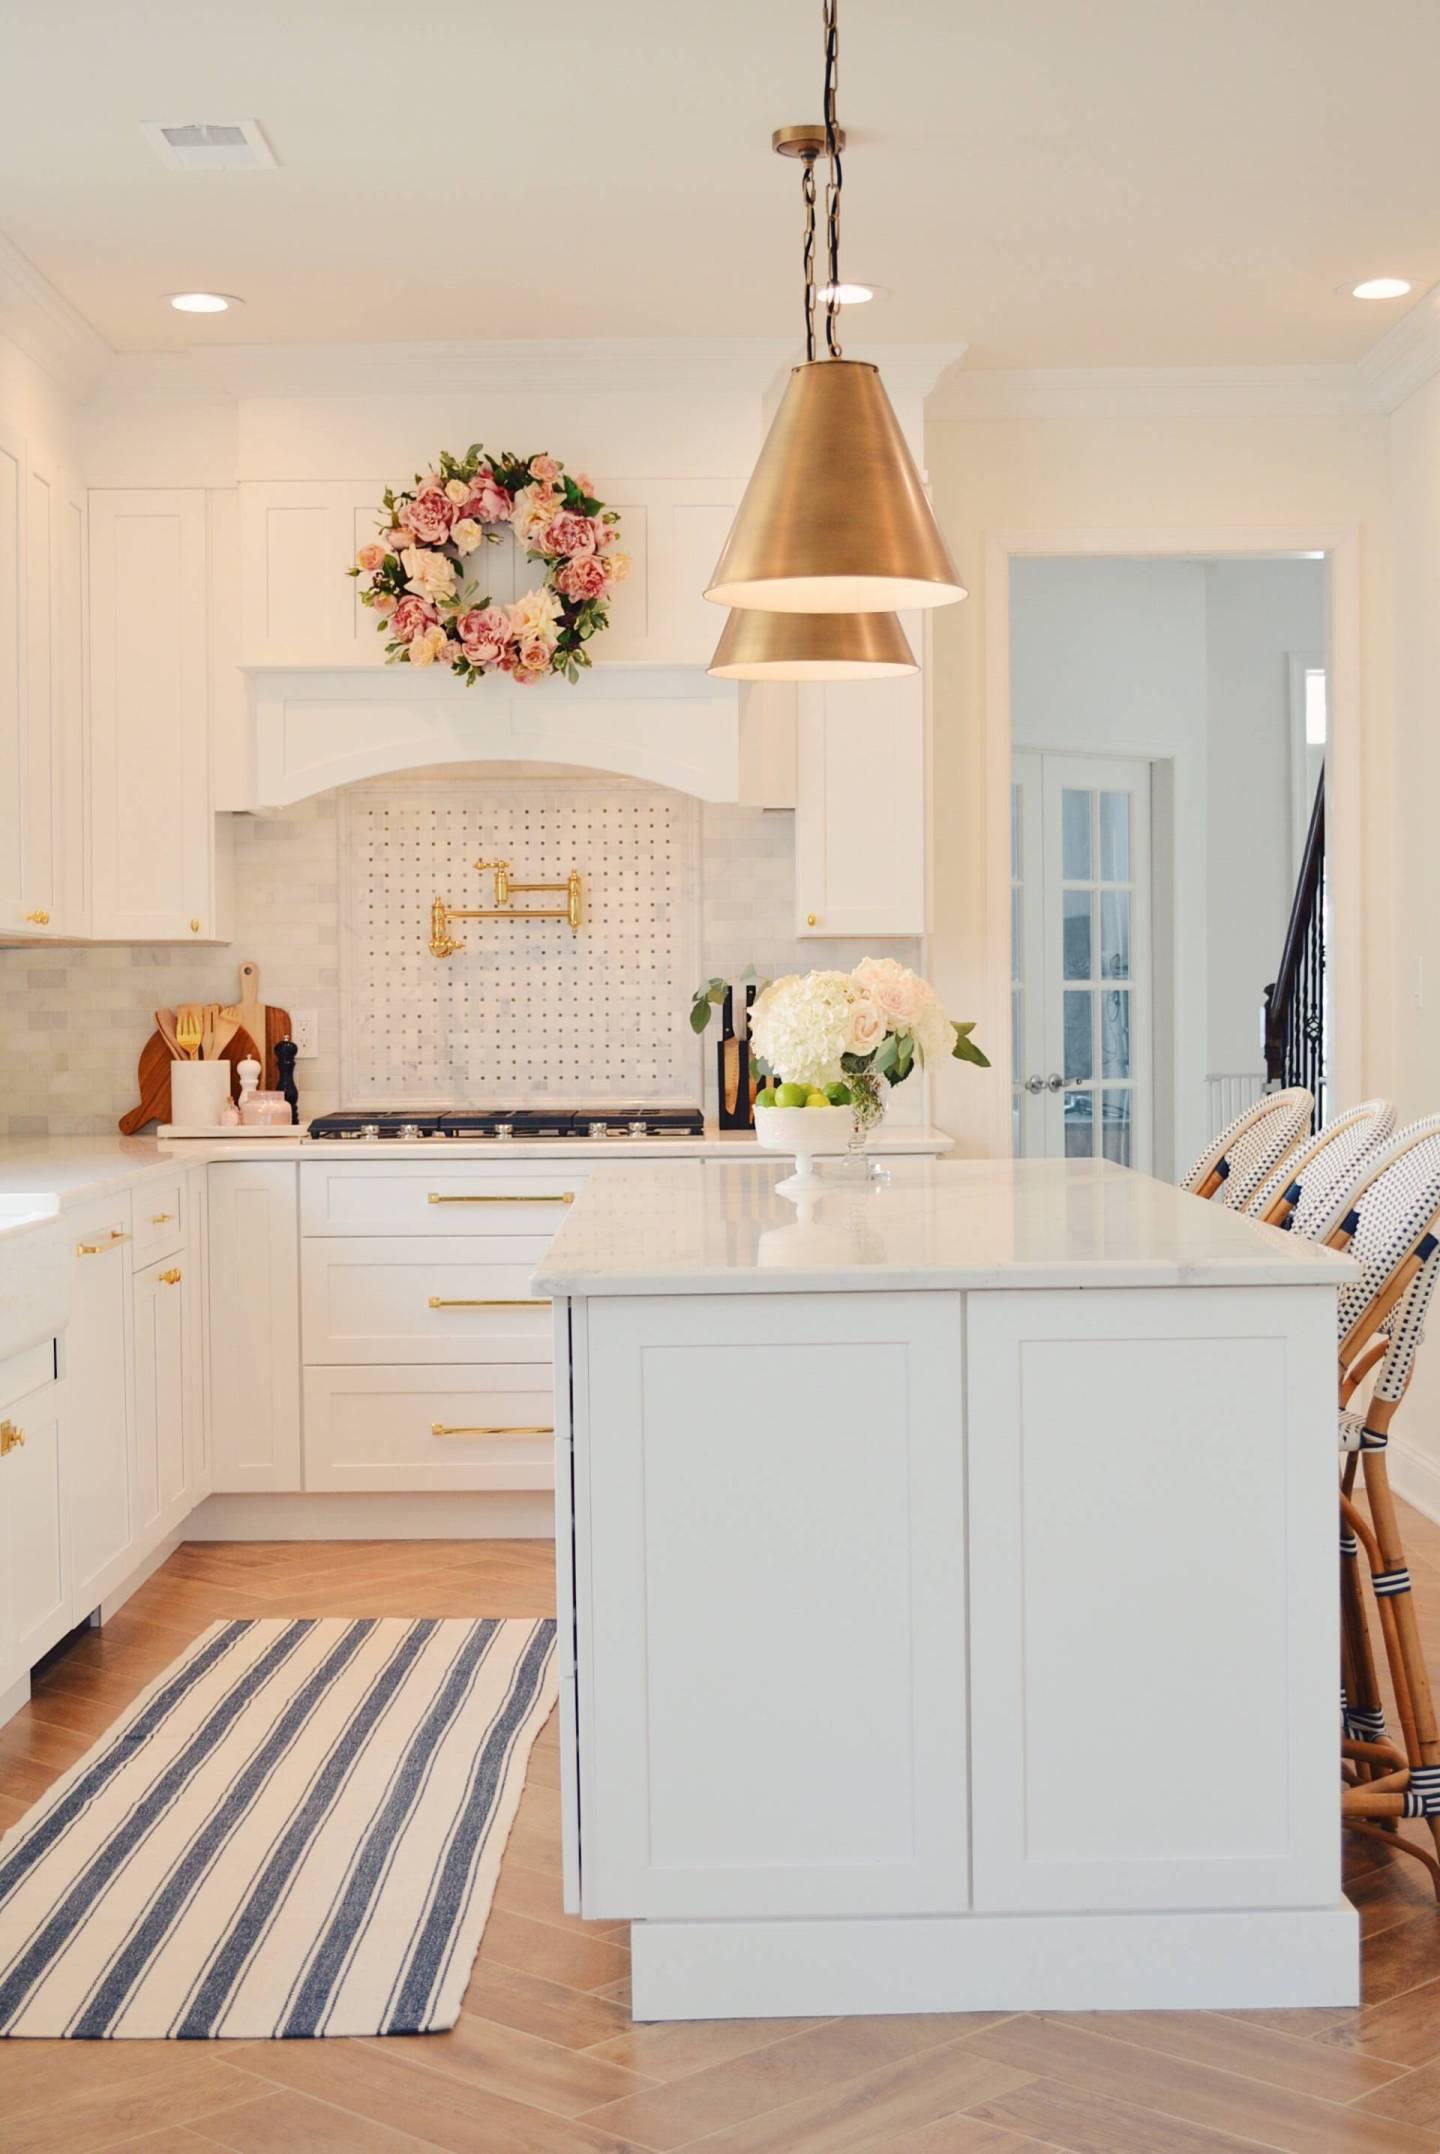 DIY Kitchen Renovation - A Classic White Kitchen Remodel